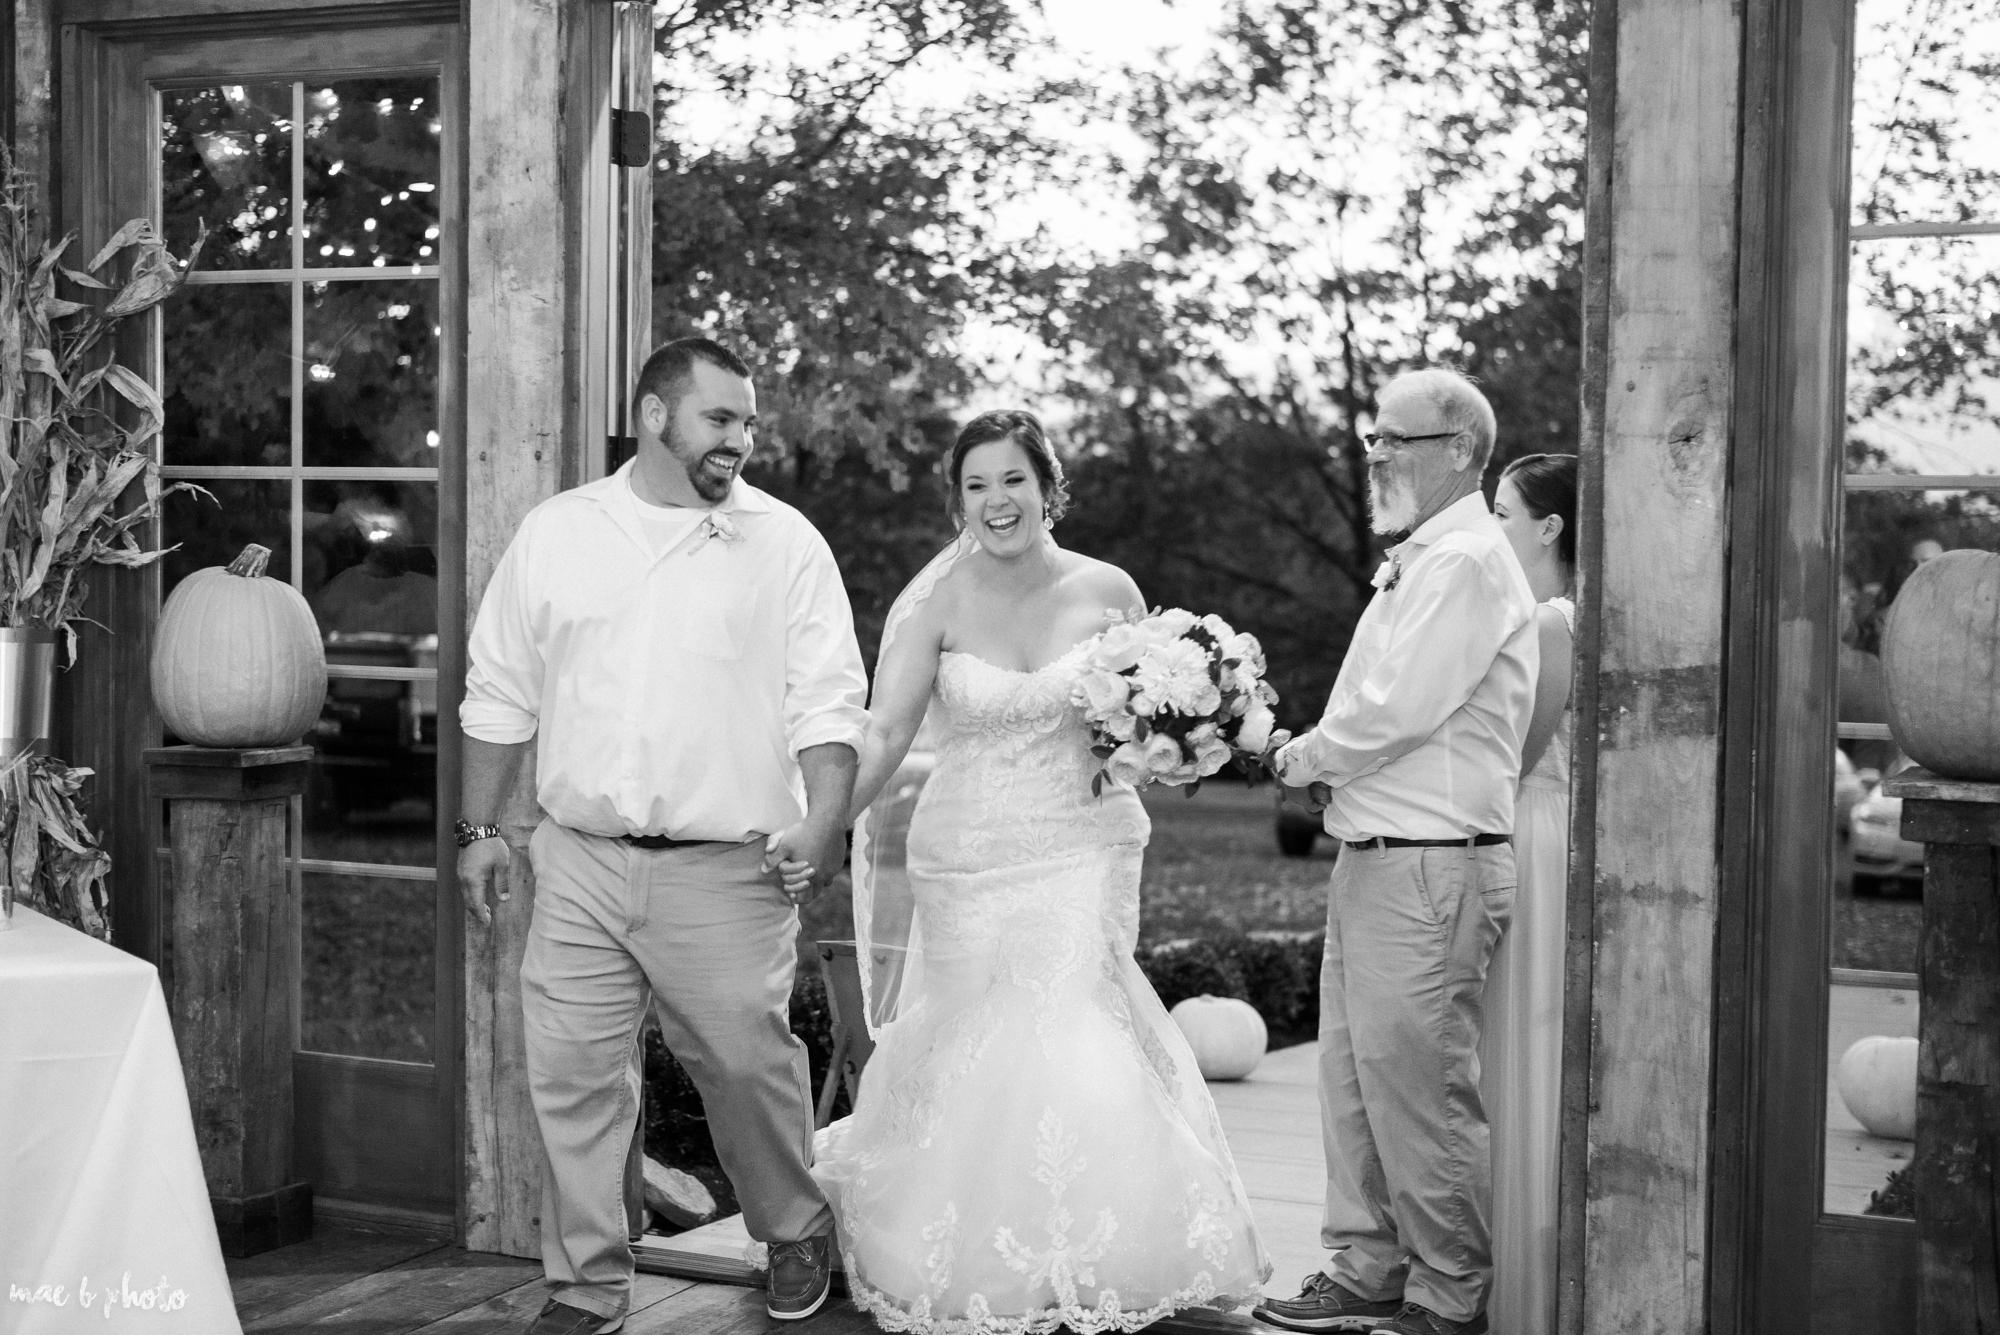 Sarah & Dustin's Rustic Chic Barn Wedding at Hartford Hill Winery in Hartford, Ohio by Mae B Photo-105.jpg